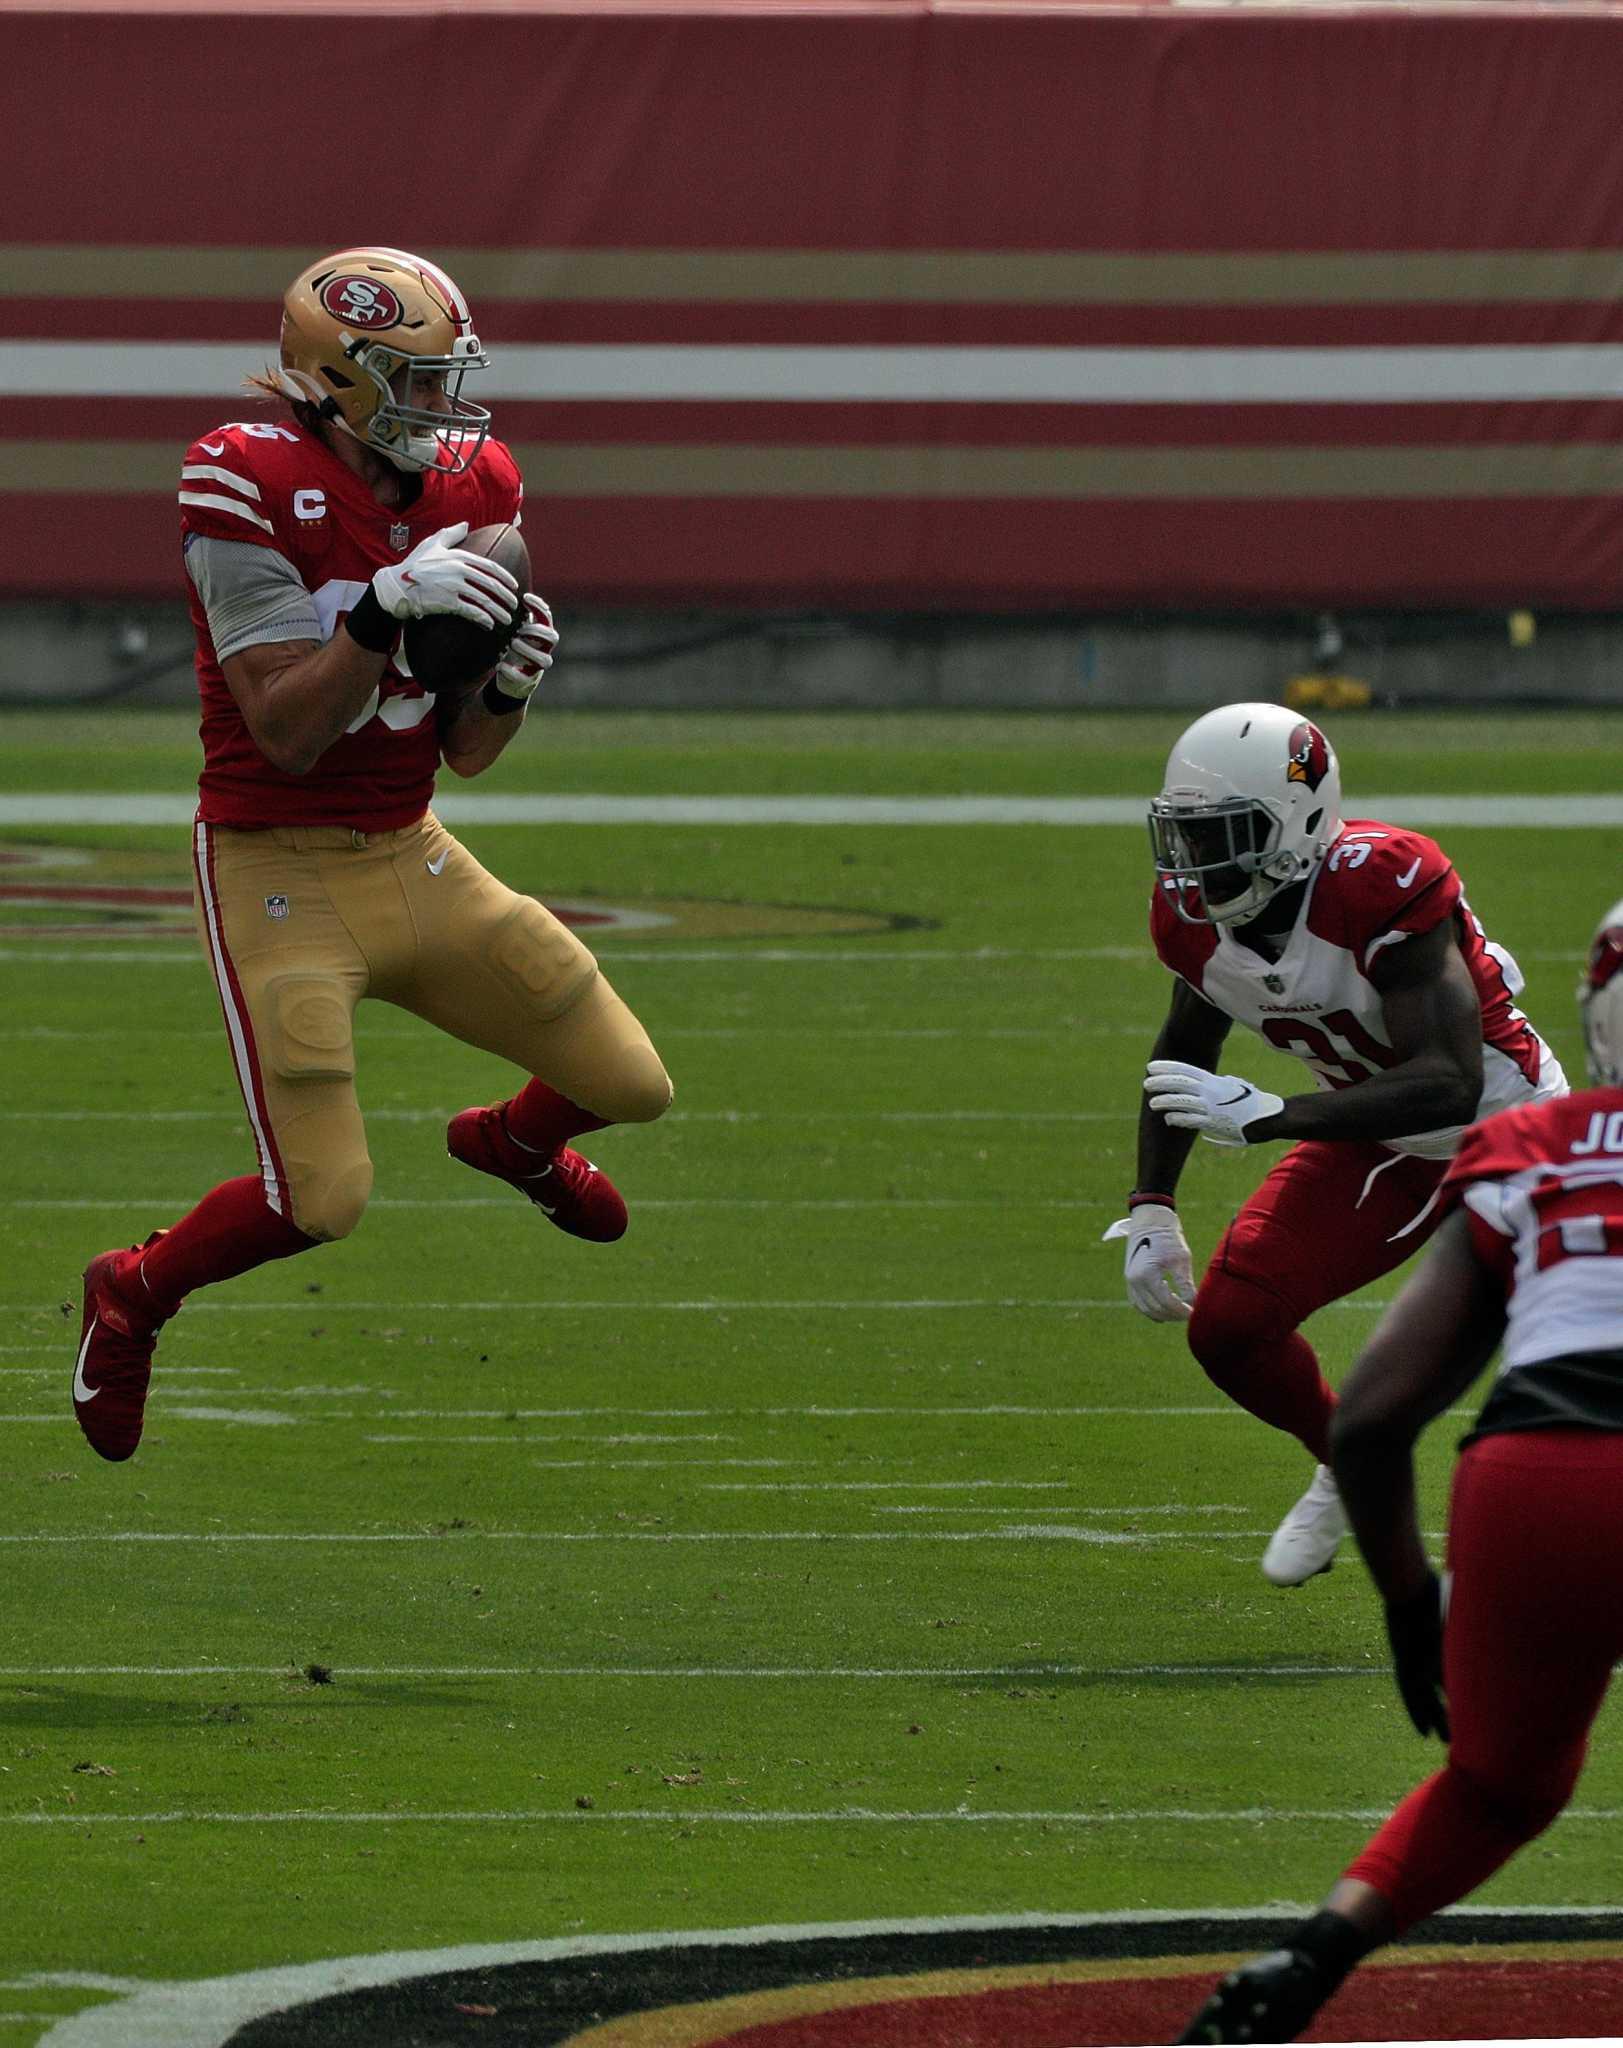 49ers vs jets - photo #26